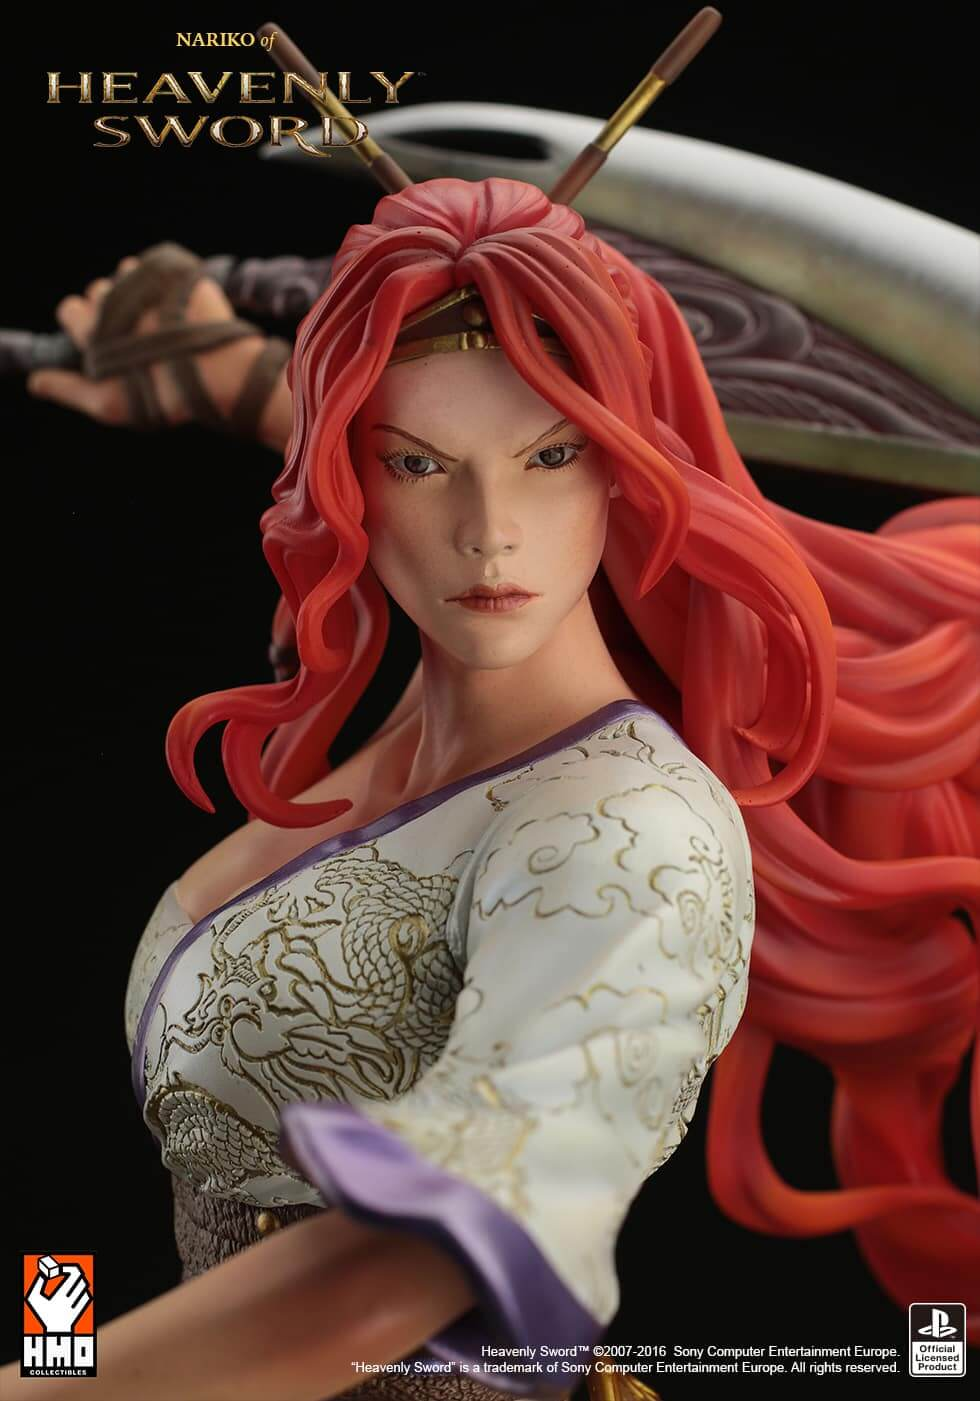 Fire Dragon Wallpapers 3d Heavenly Sword Nariko H M O Collectibles